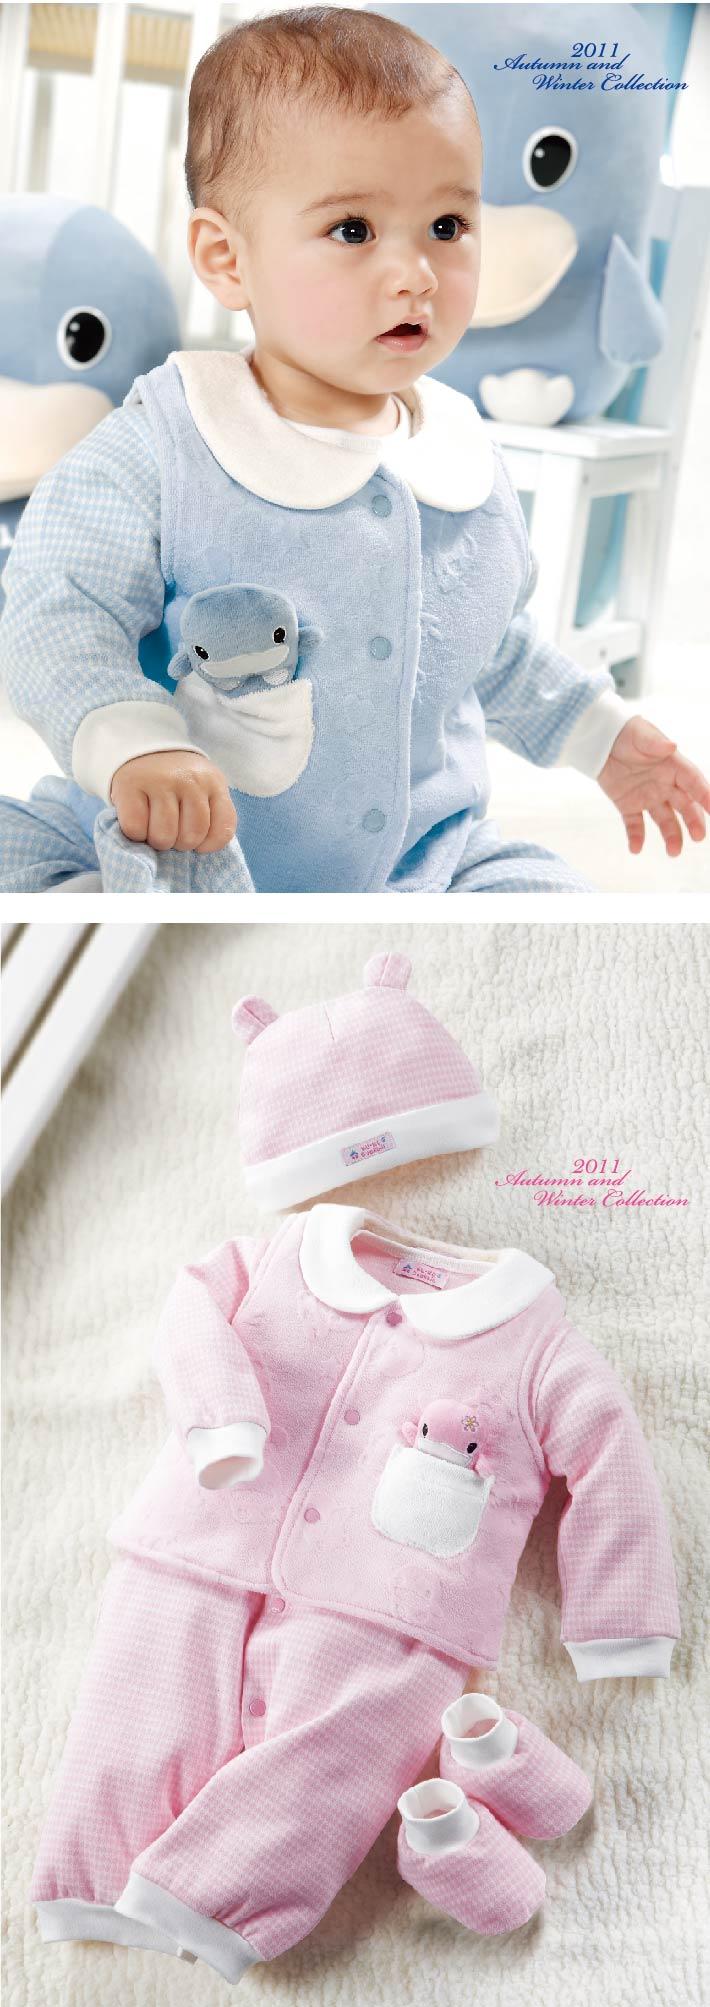 proimages/Seasonal_clothing/2011Autumn_Winter/8294/KU8294.jpg